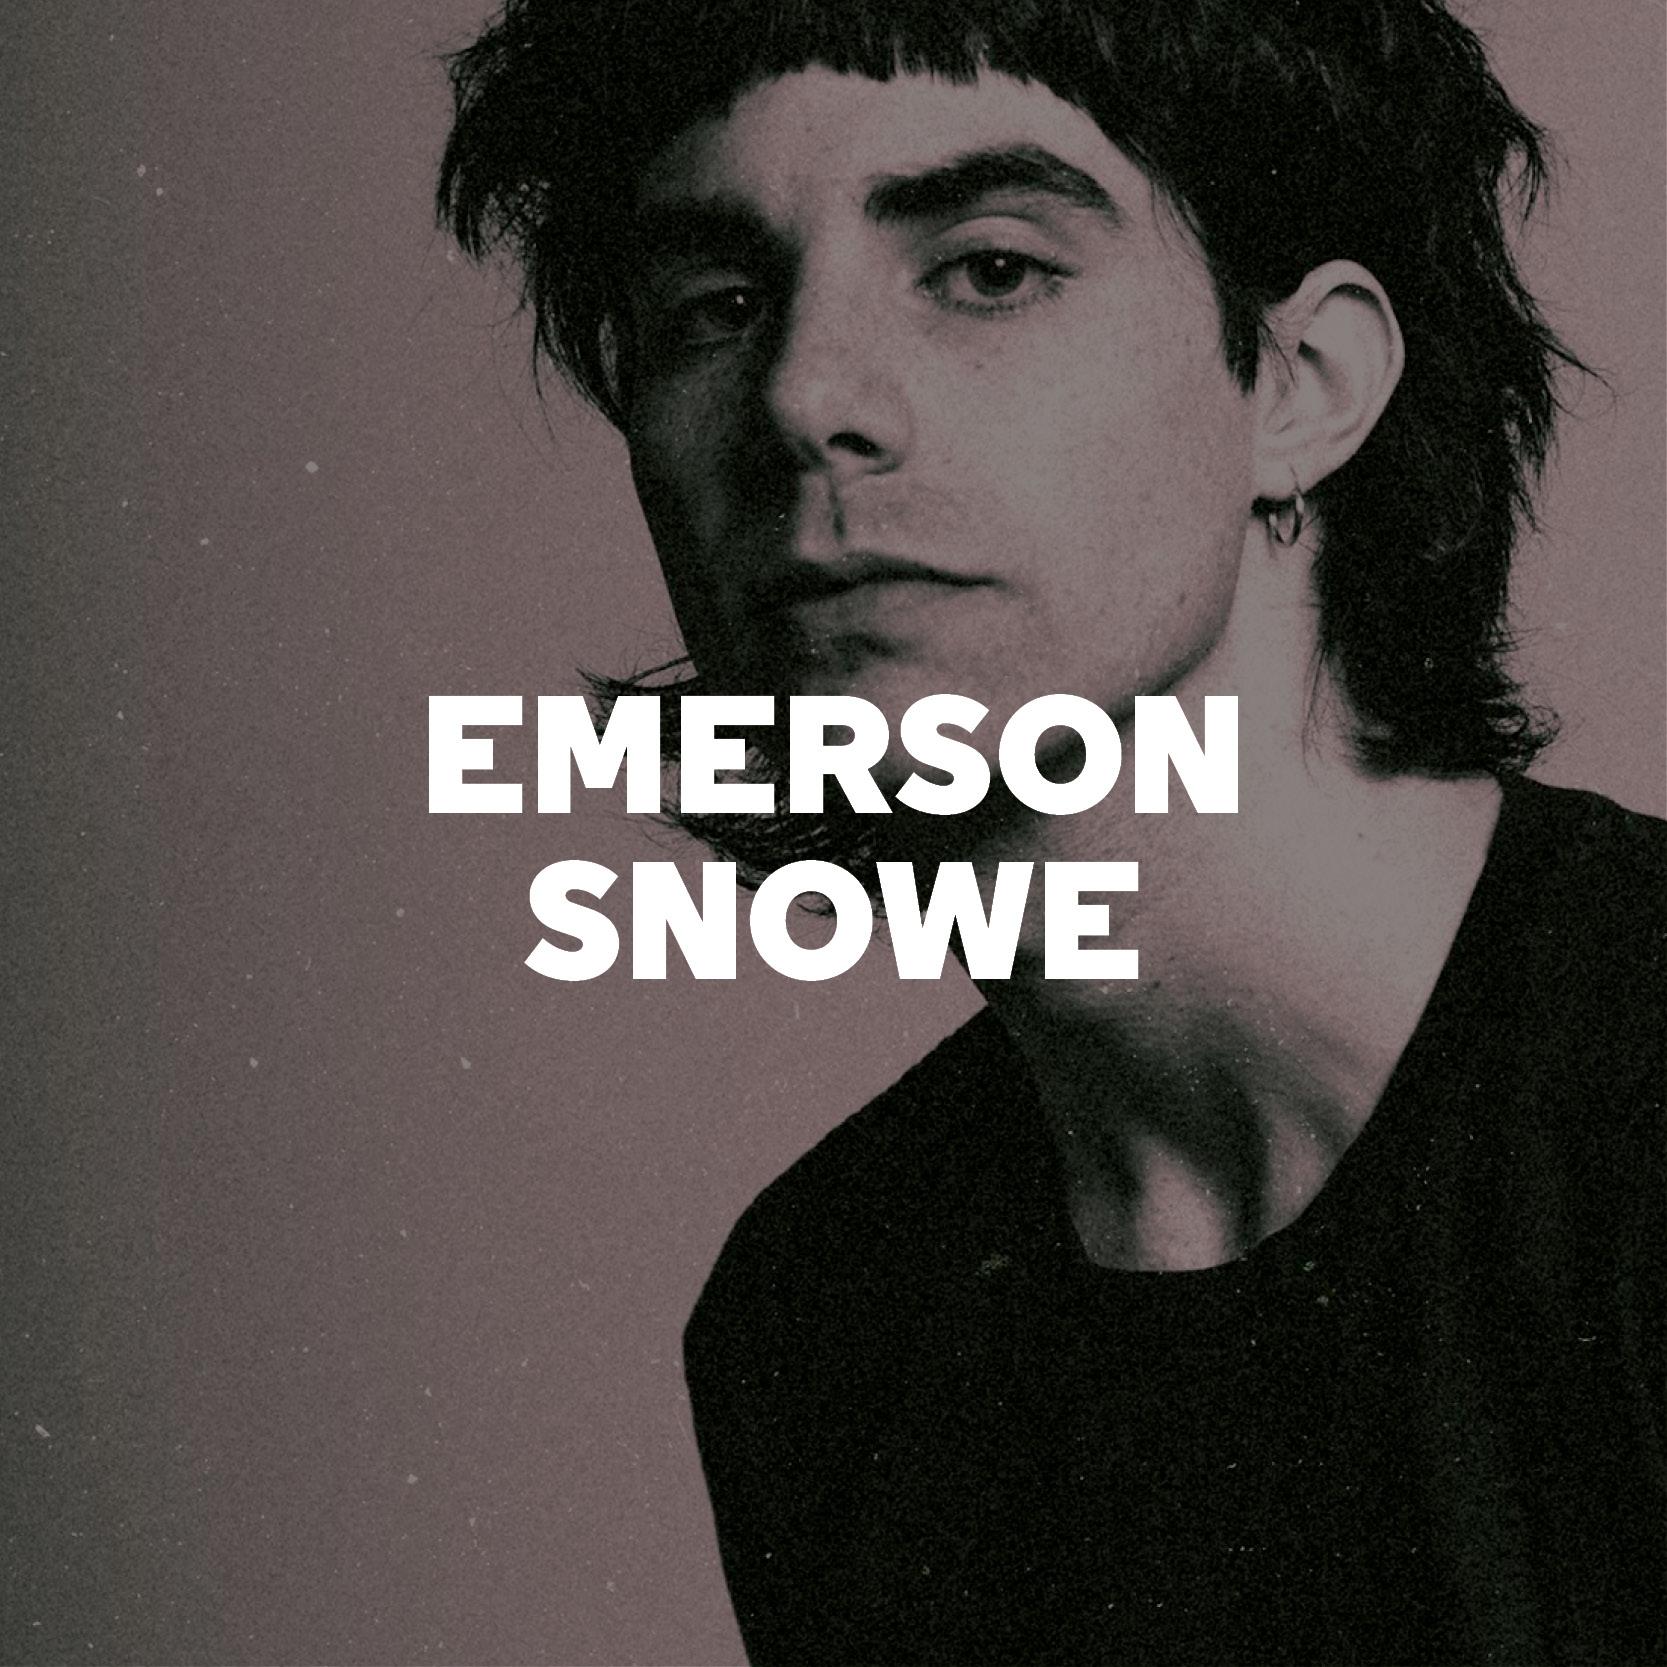 EMERSON SNOWE